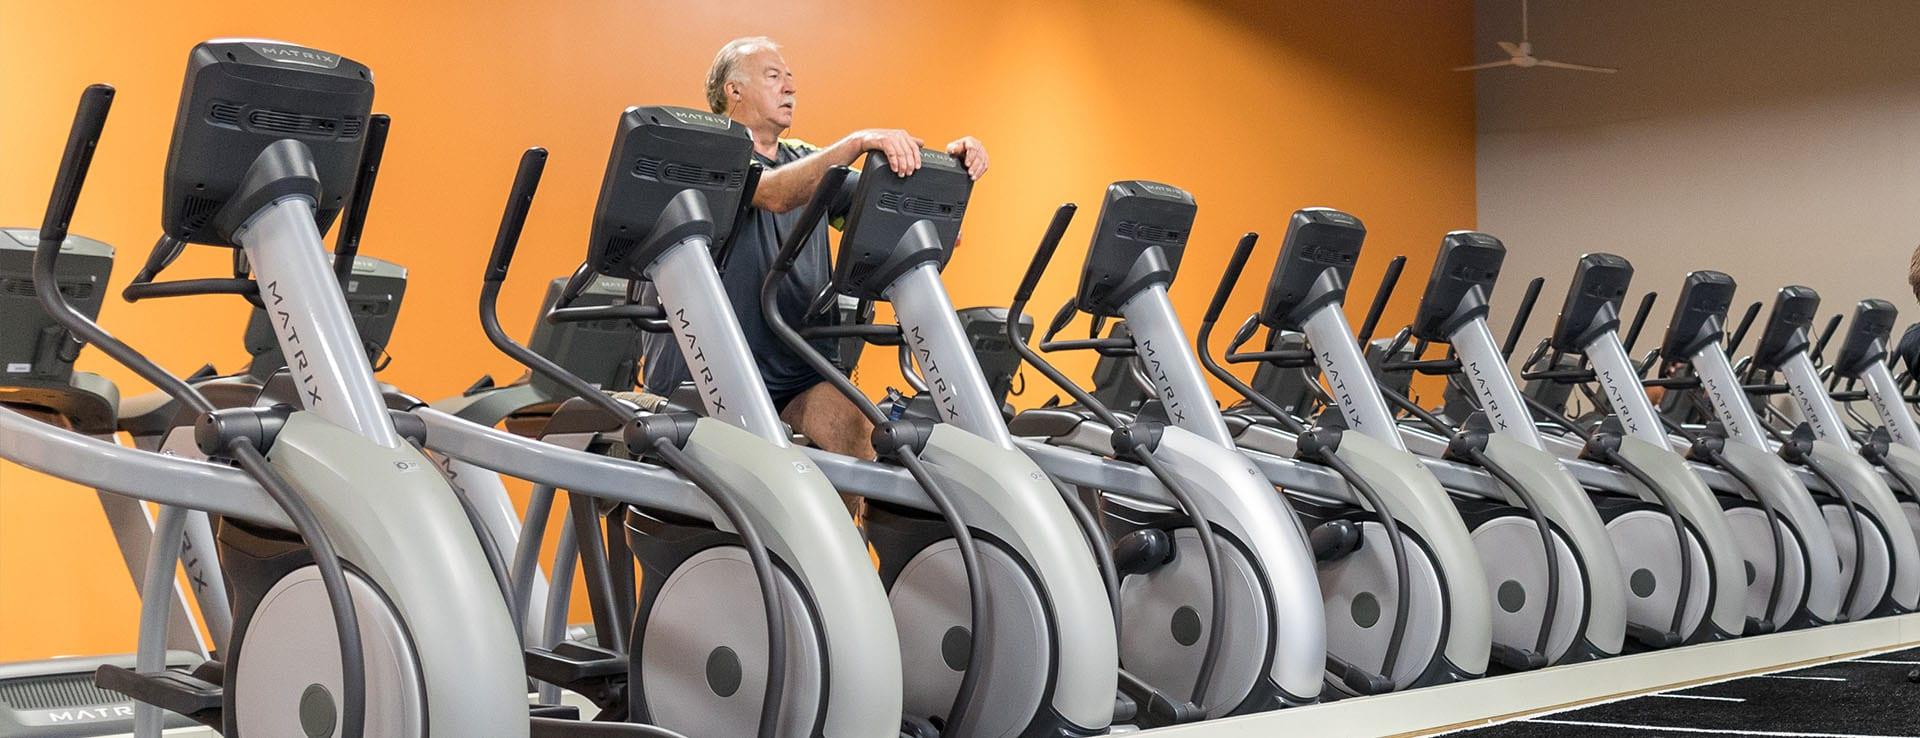 man using cardio machine in spacious modern gym